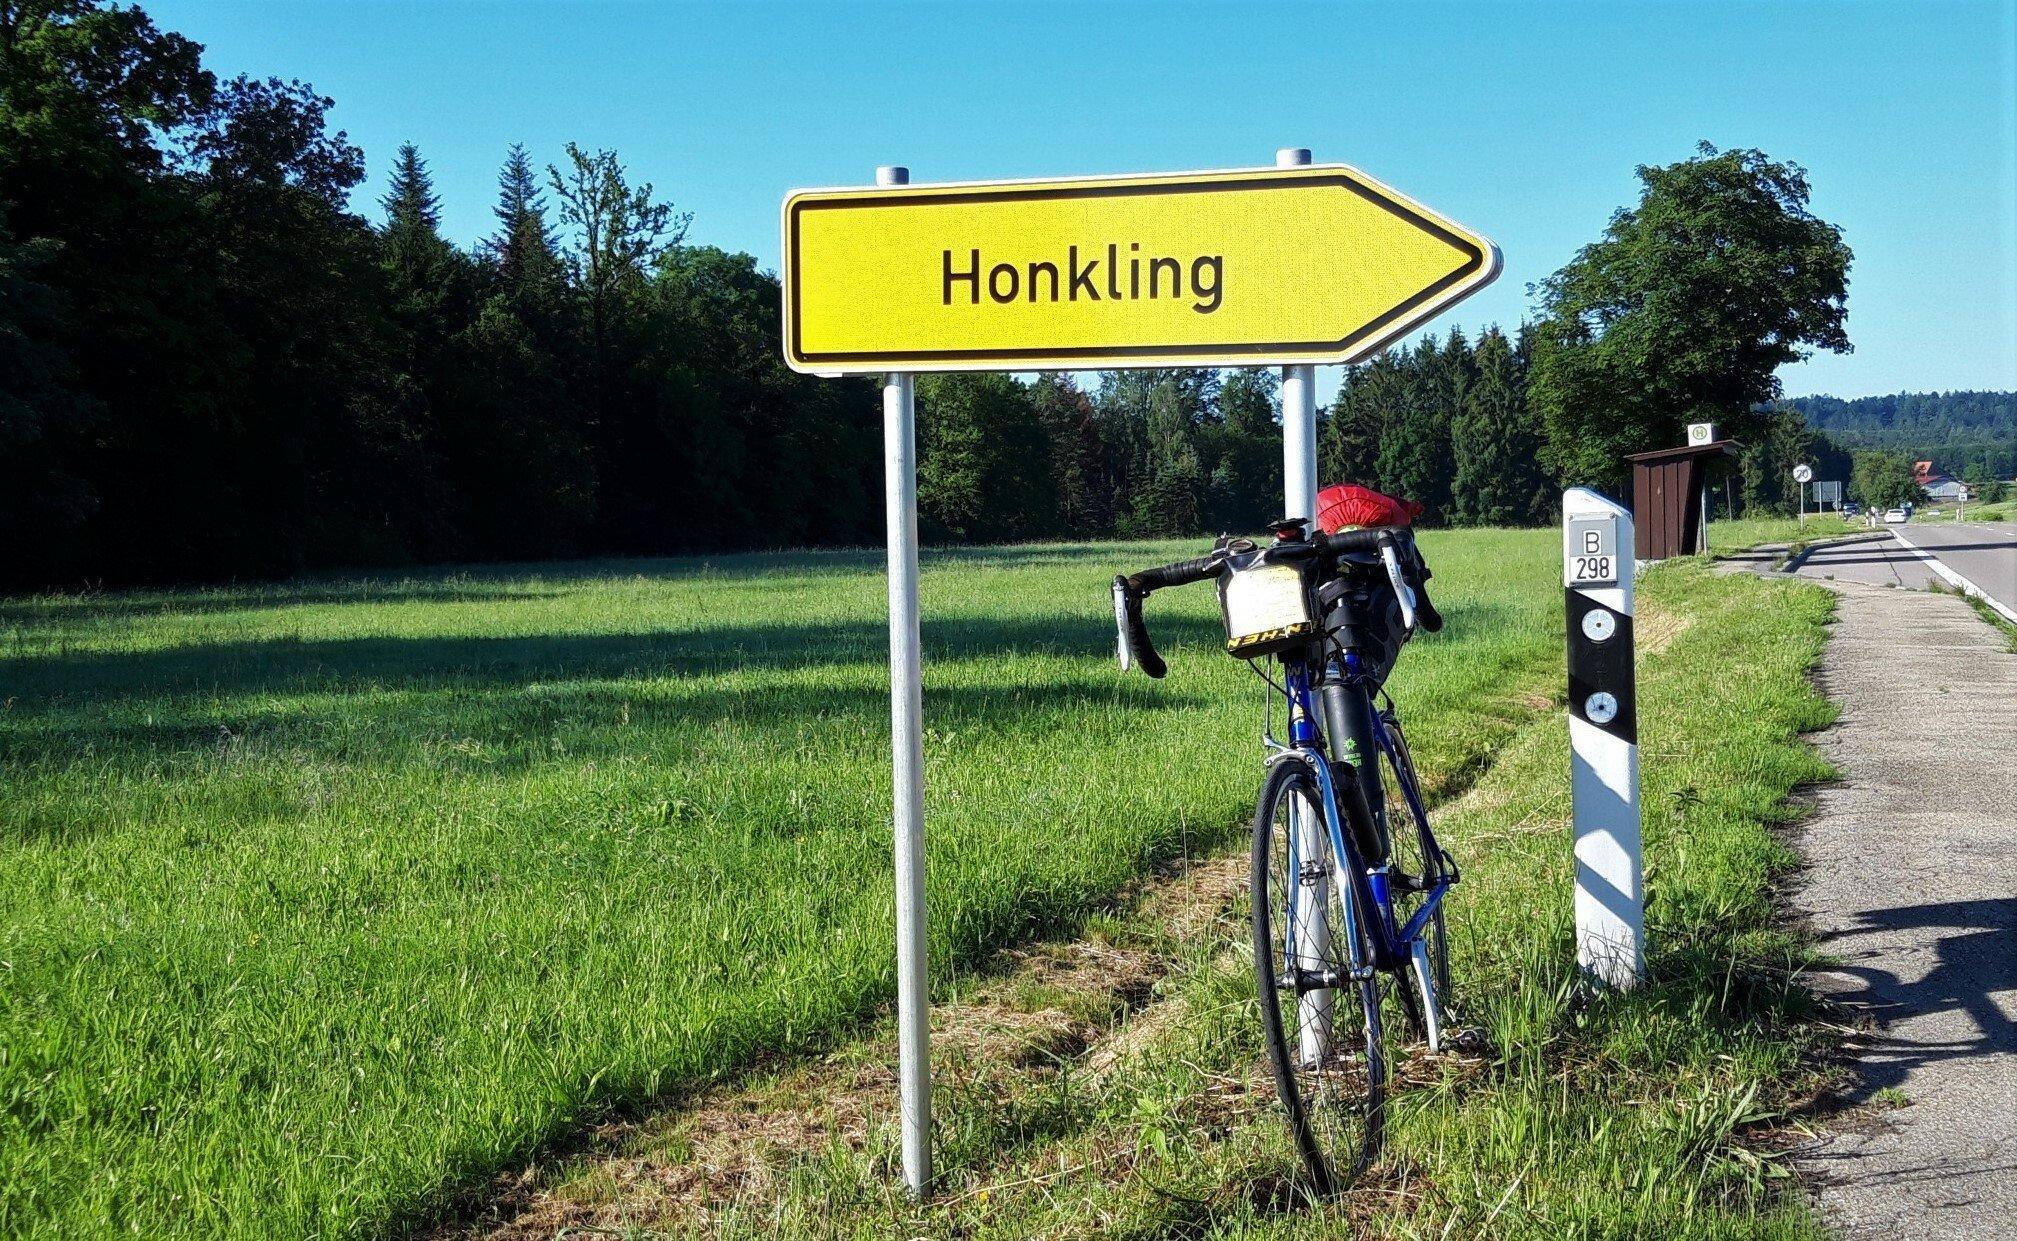 Ortsschild des Weilers namens Honkling.